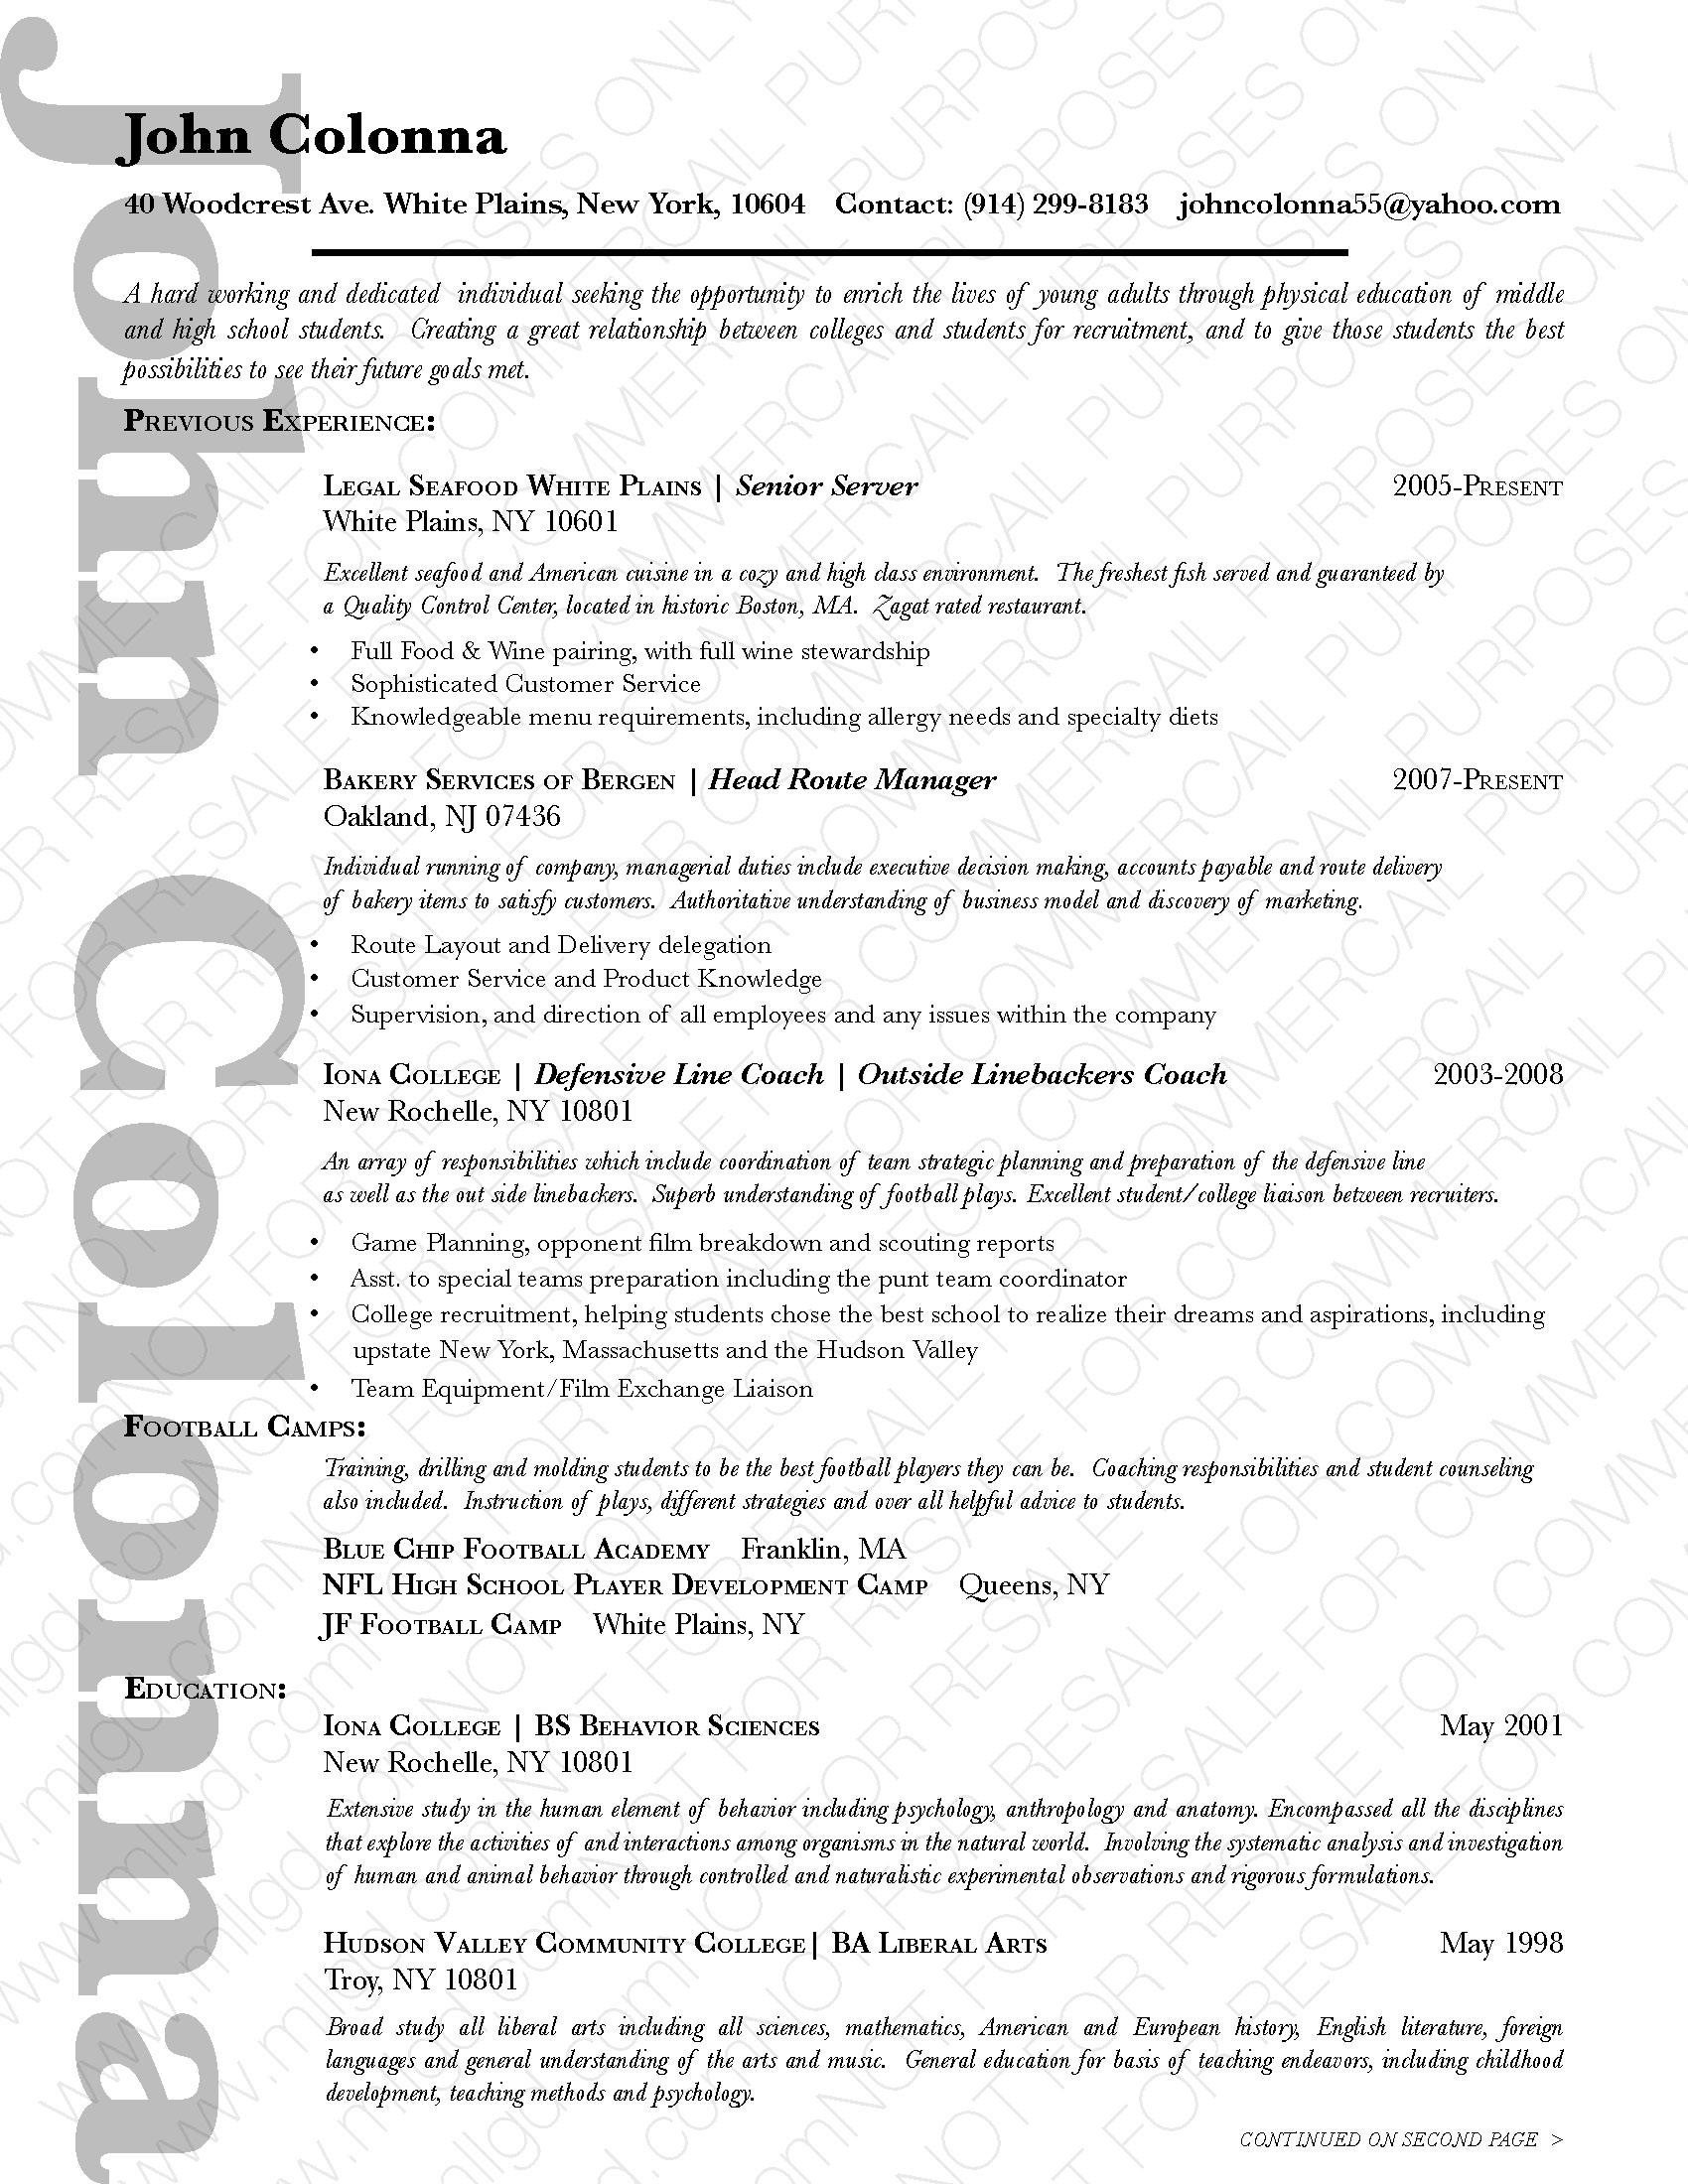 MLL_Resume_Design_2014_Page_39.jpg